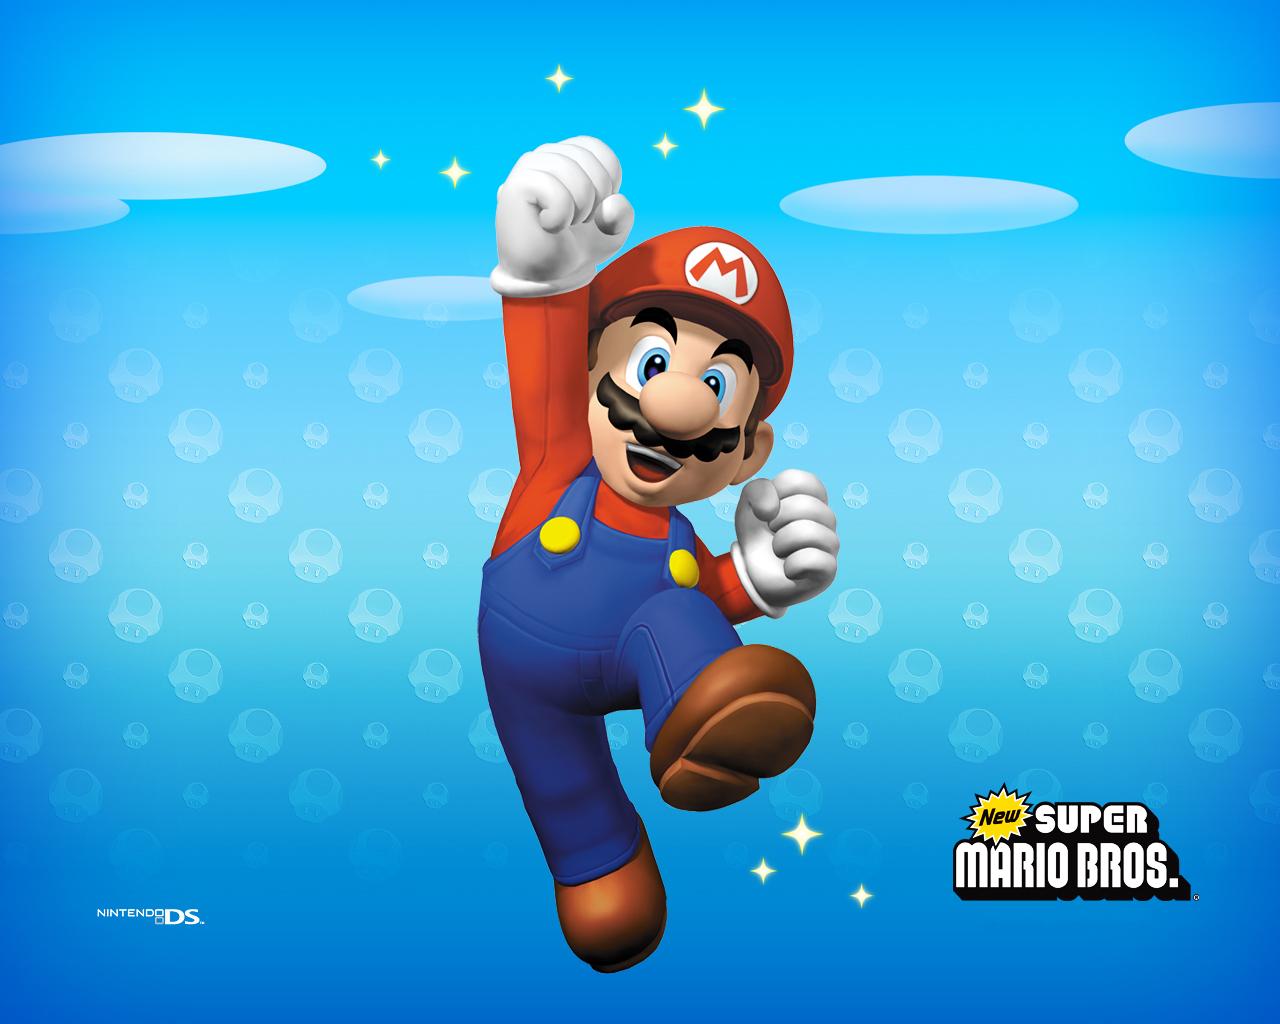 Wallpaper iphone mario bross - New Super Mario Brothers Wallpaper Super Mario Bros